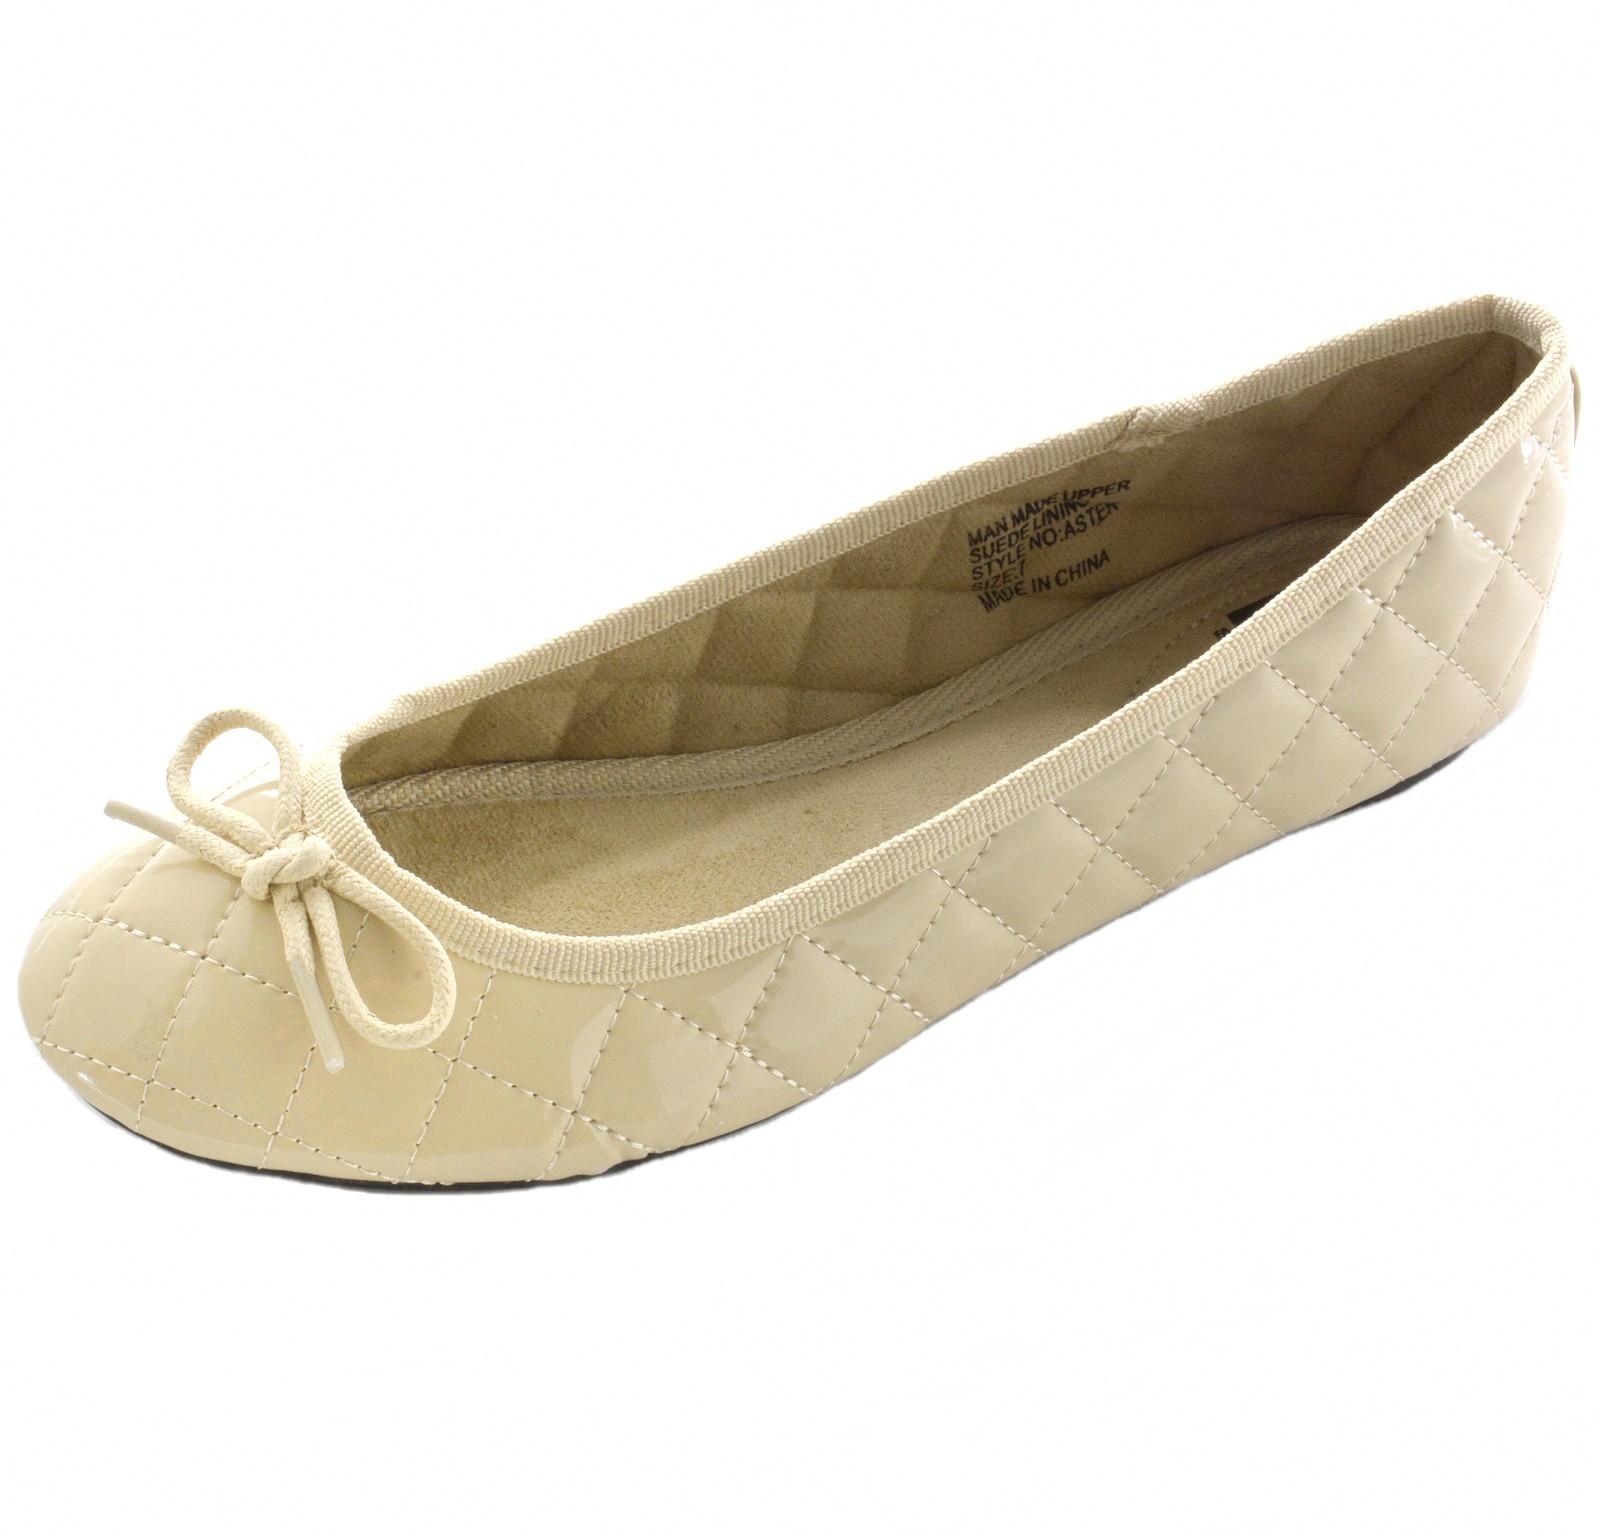 flats ballerina fabric flower women feminino flat shoes ballet peking embroidered comforter products linen on cotton old vintage comfortable slip sapato